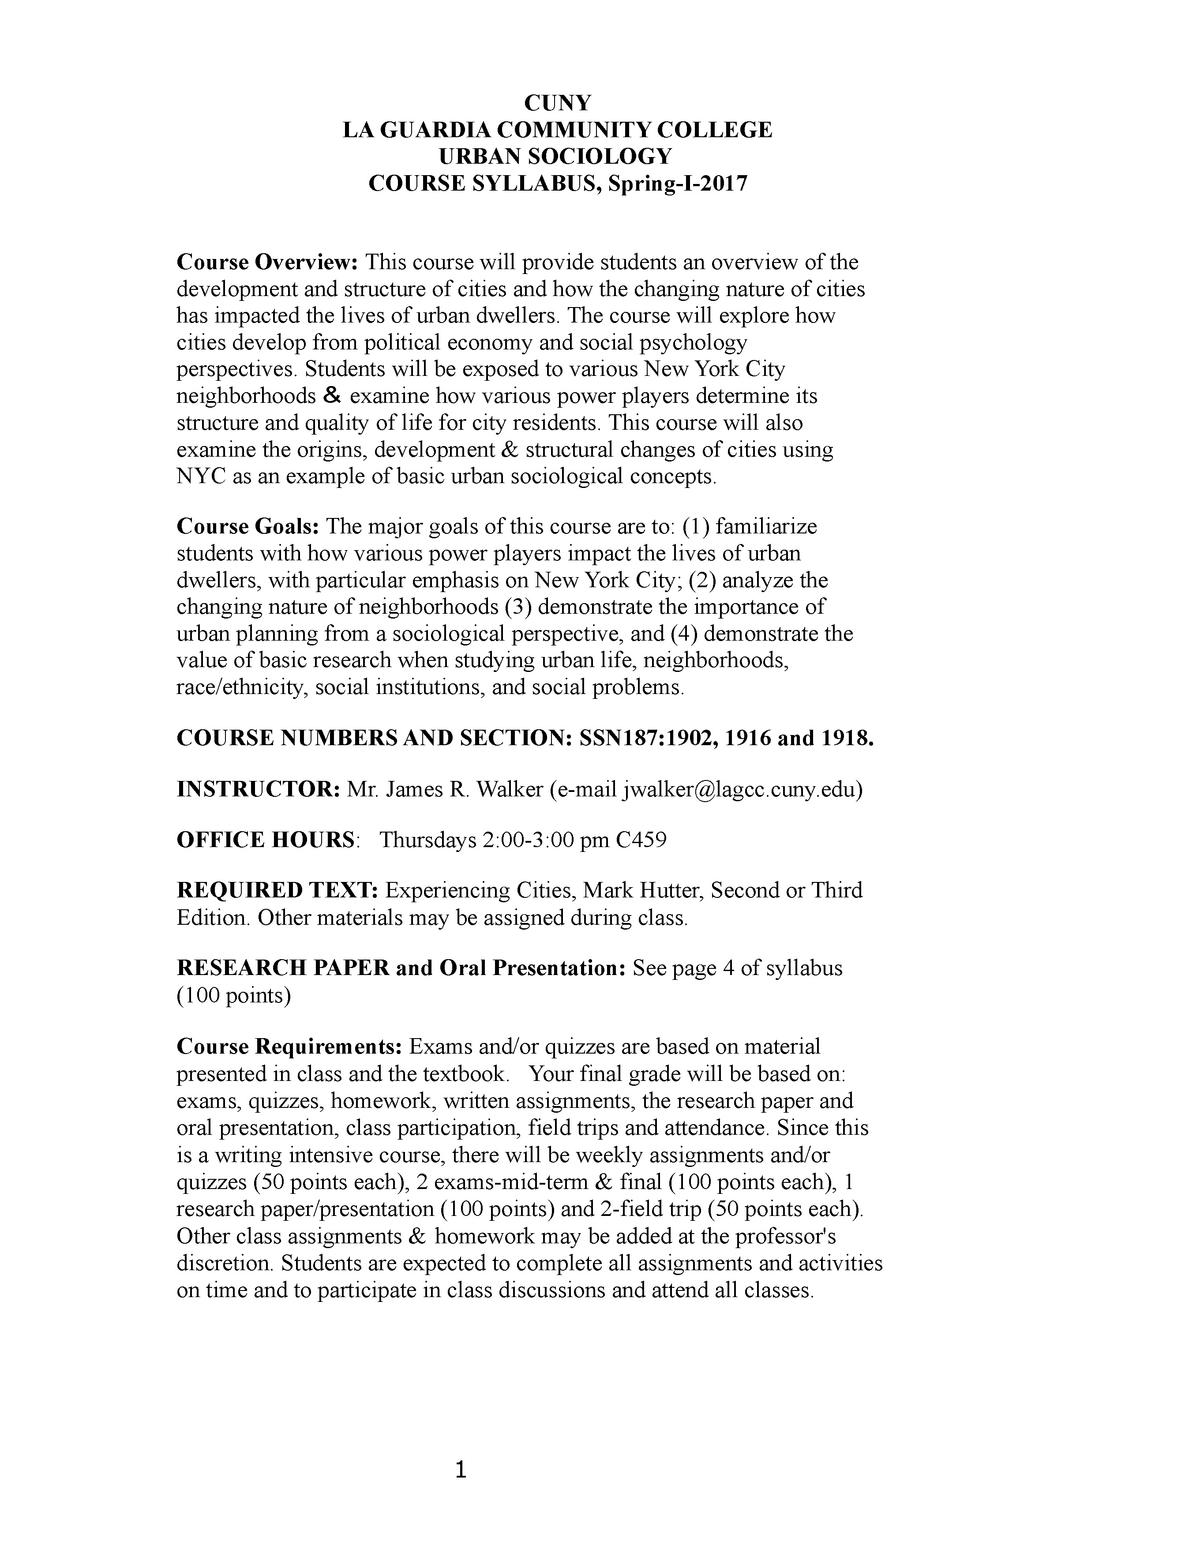 Urban syllabus Spring I 2017 - SSN 187: Urban Sociology